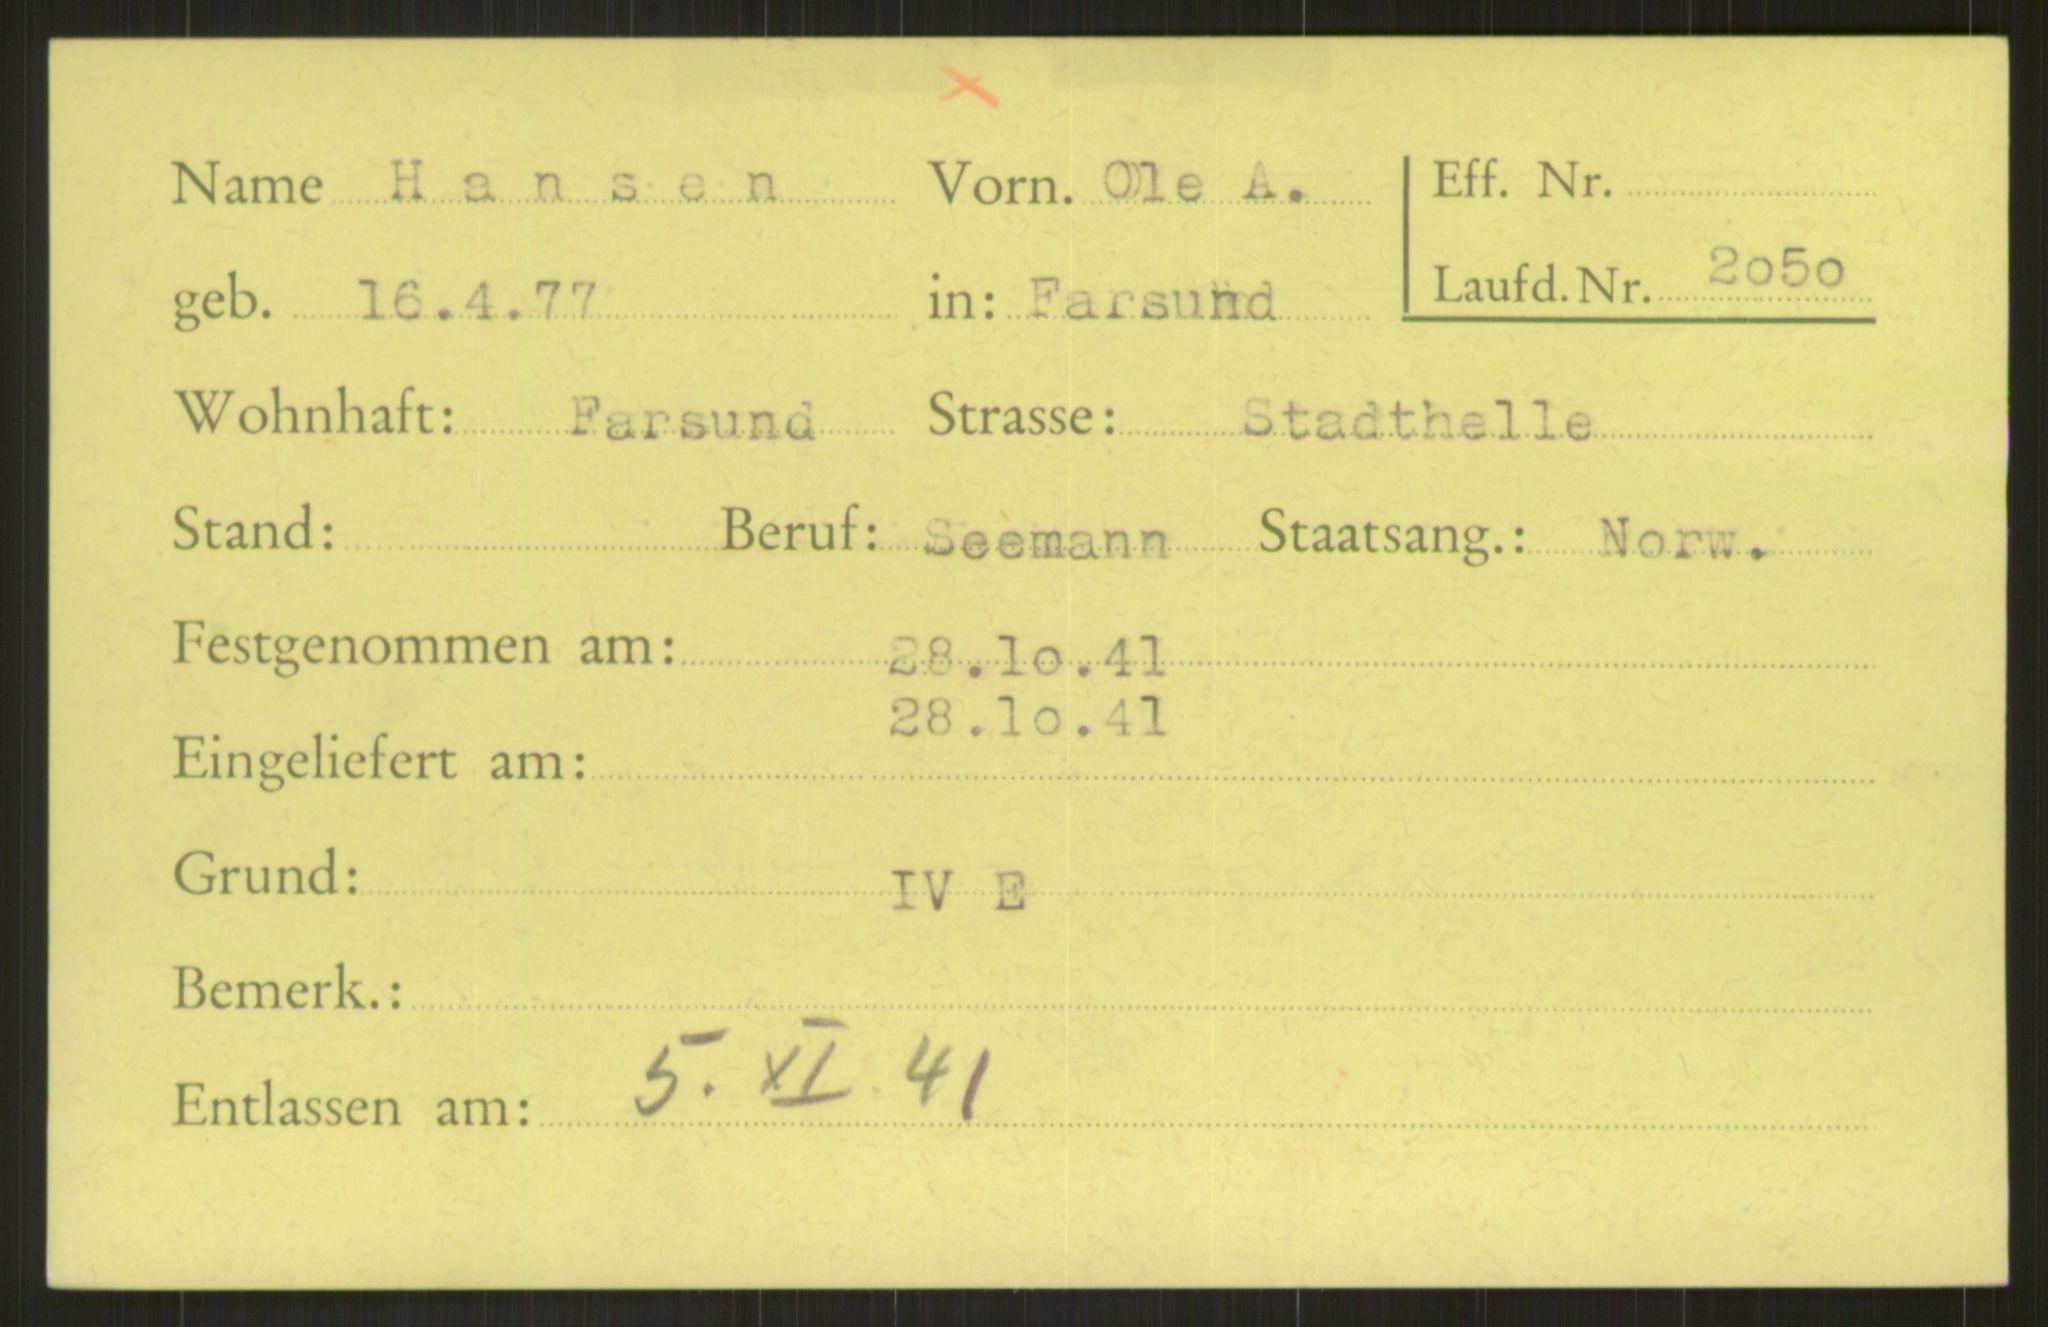 RA, Befehlshaber der Sicherheitspolizei und des SD, E/Ea/Eab/L0002: Register over norske fanger i Møllergata 19 ordnet etter fangenummer: 2050-2999, 1940-1945